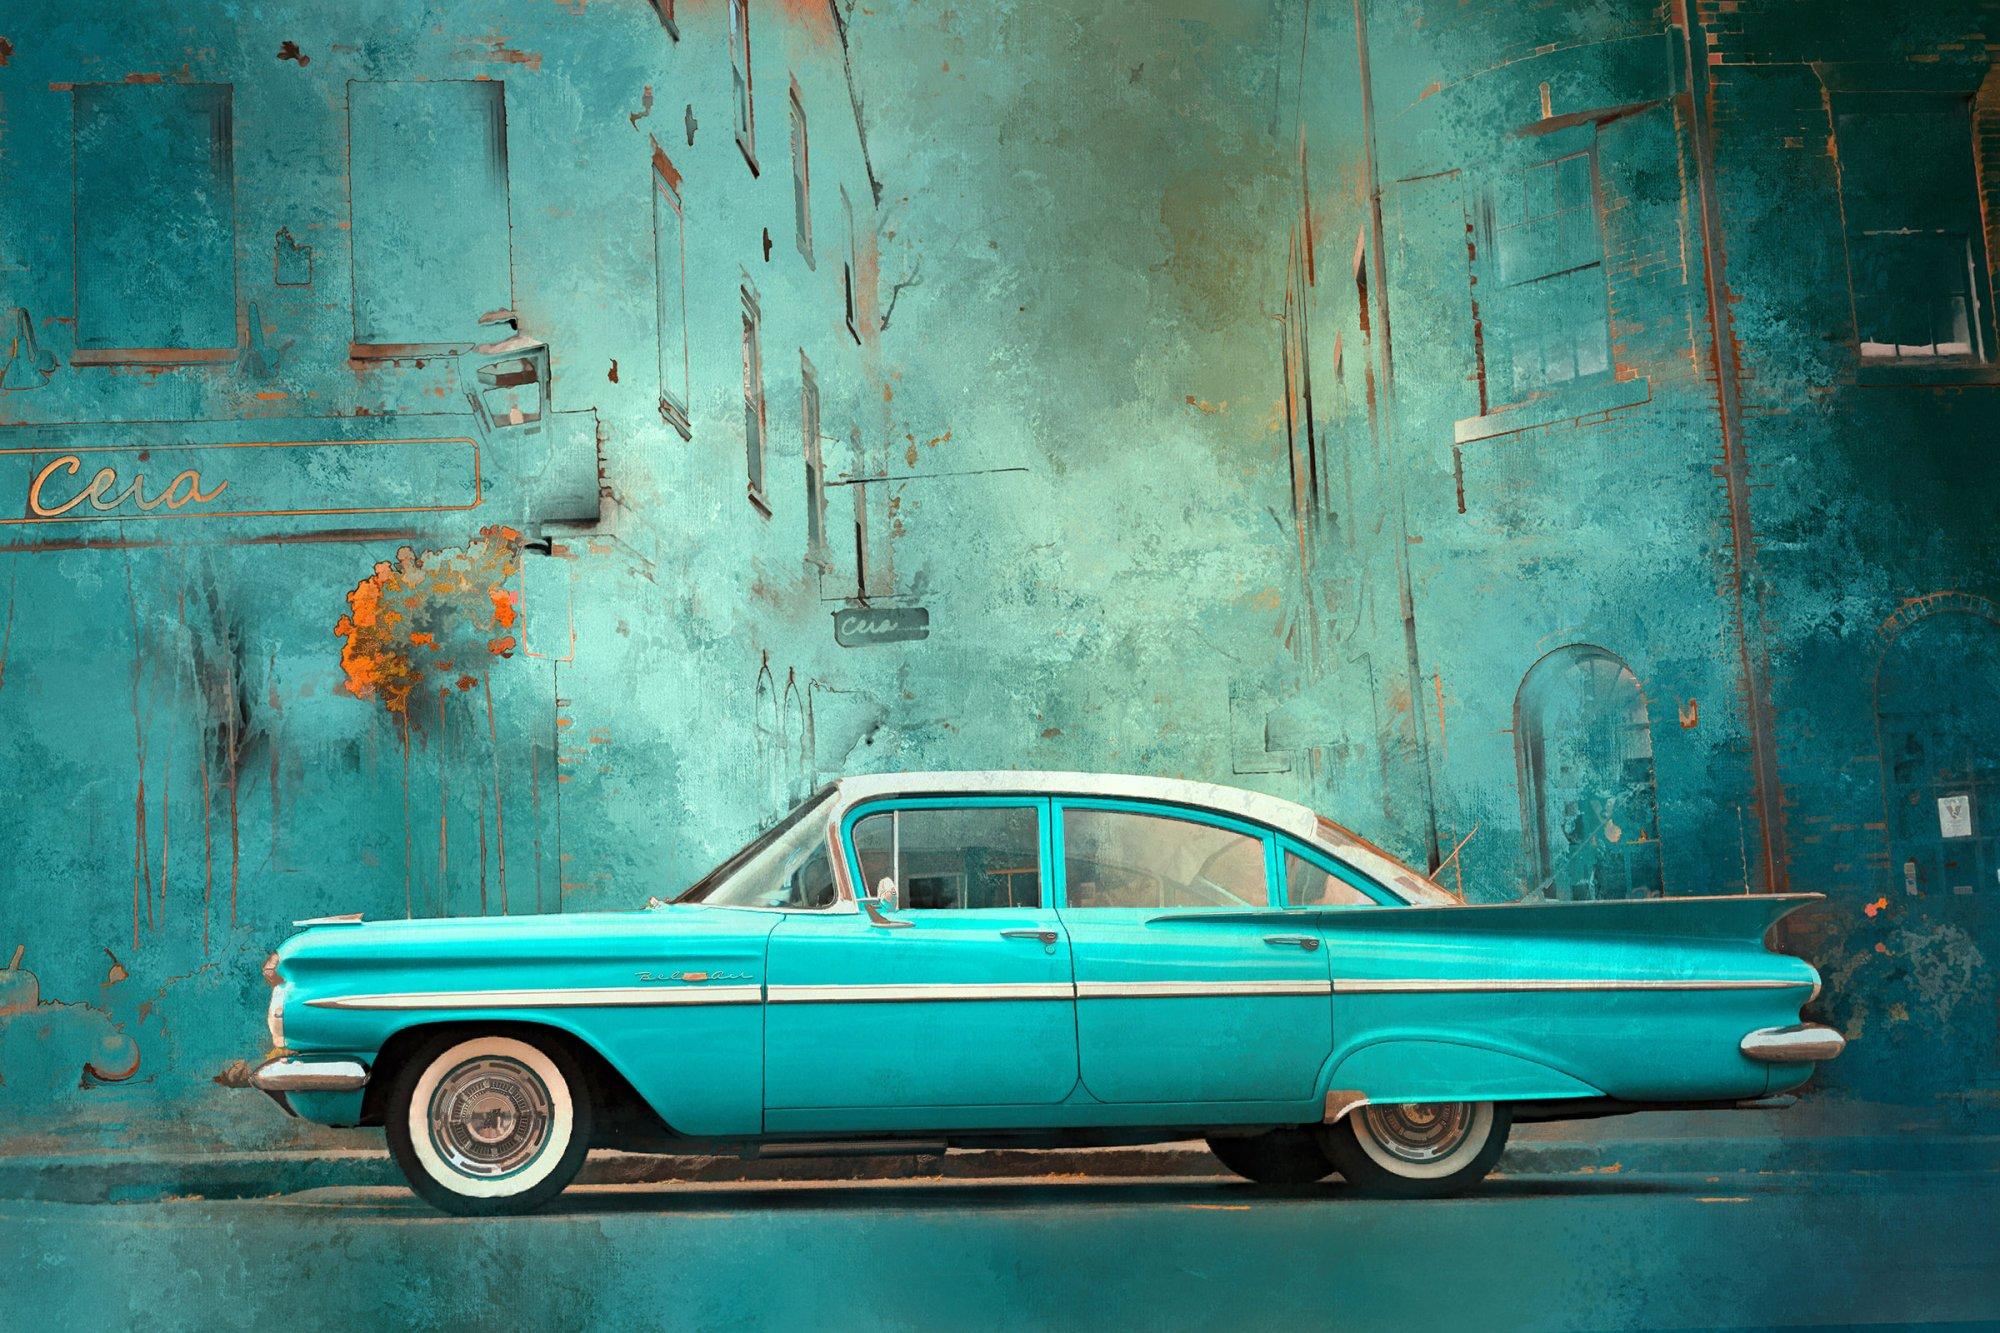 Cruisin' Turquoise Chevy